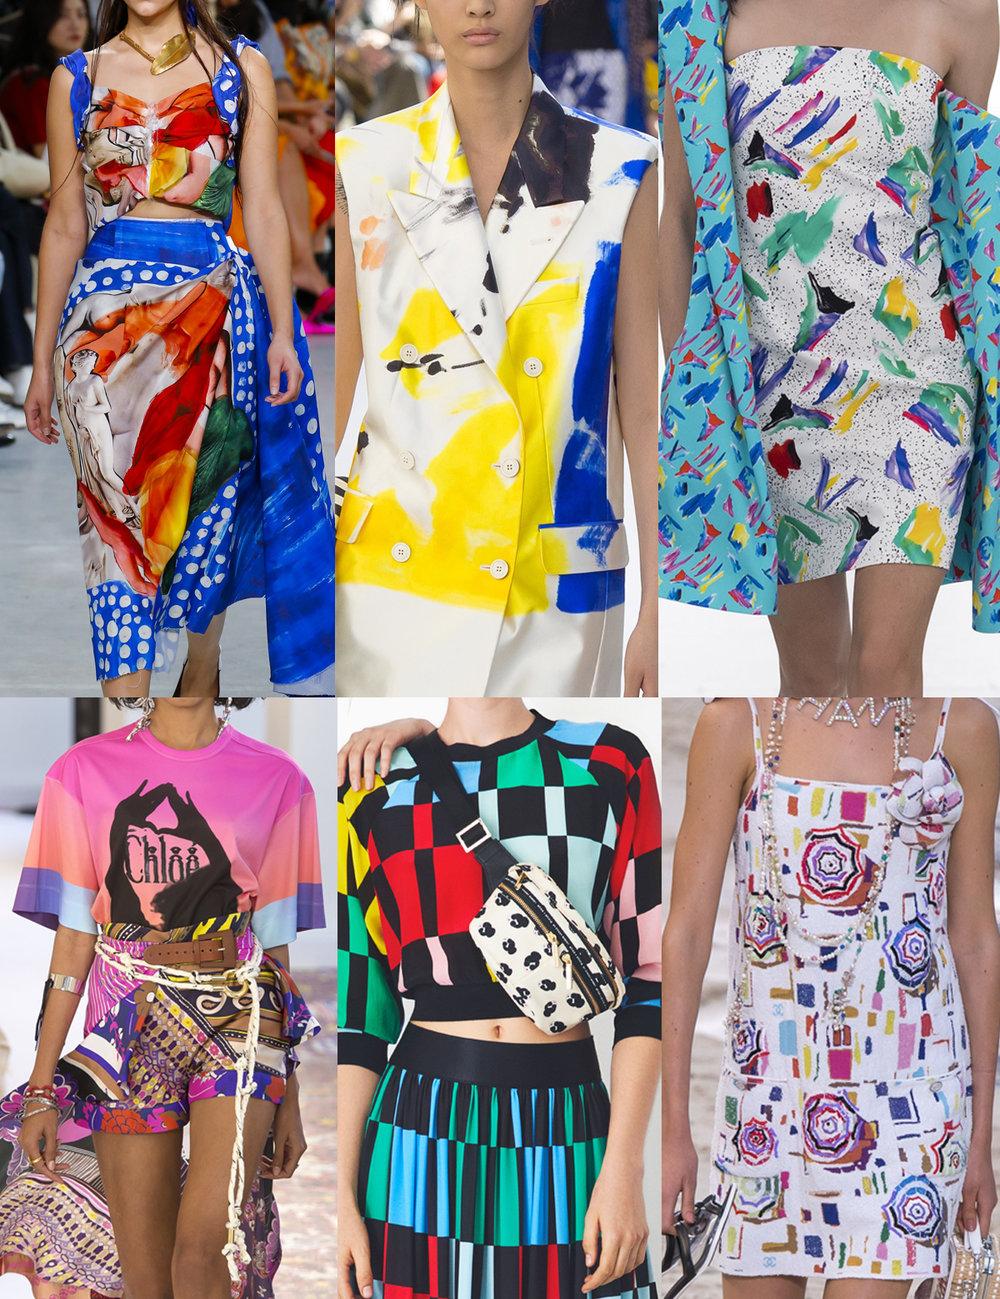 Spring 2019 - Marni, Dries van Noten, Louis Vuitton, Chloe, Alice and Olivia, Chanel